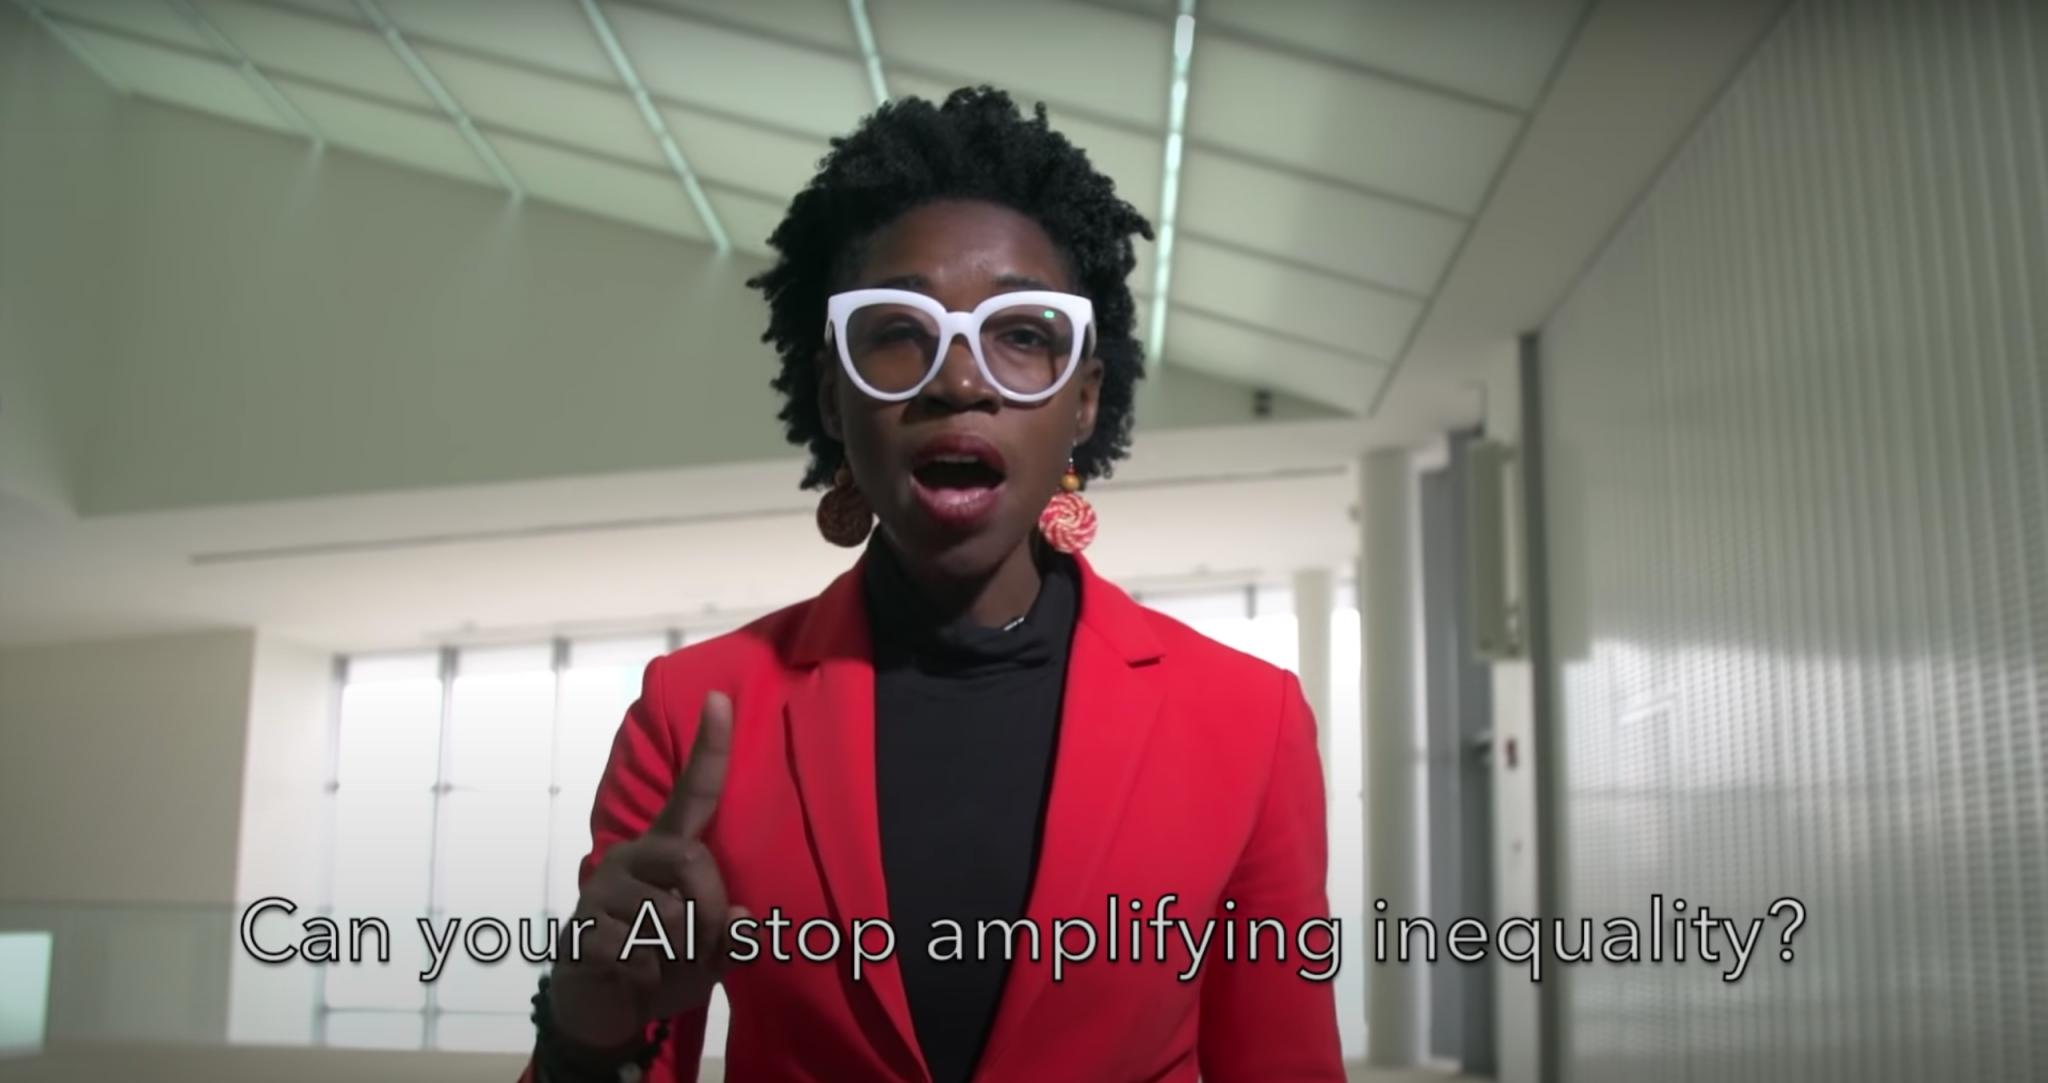 Joy Buolamwini confronts IBM over the biases she believes the company has on March 1, 2019. (Joy Buolamwini/Youtube) spectator.org